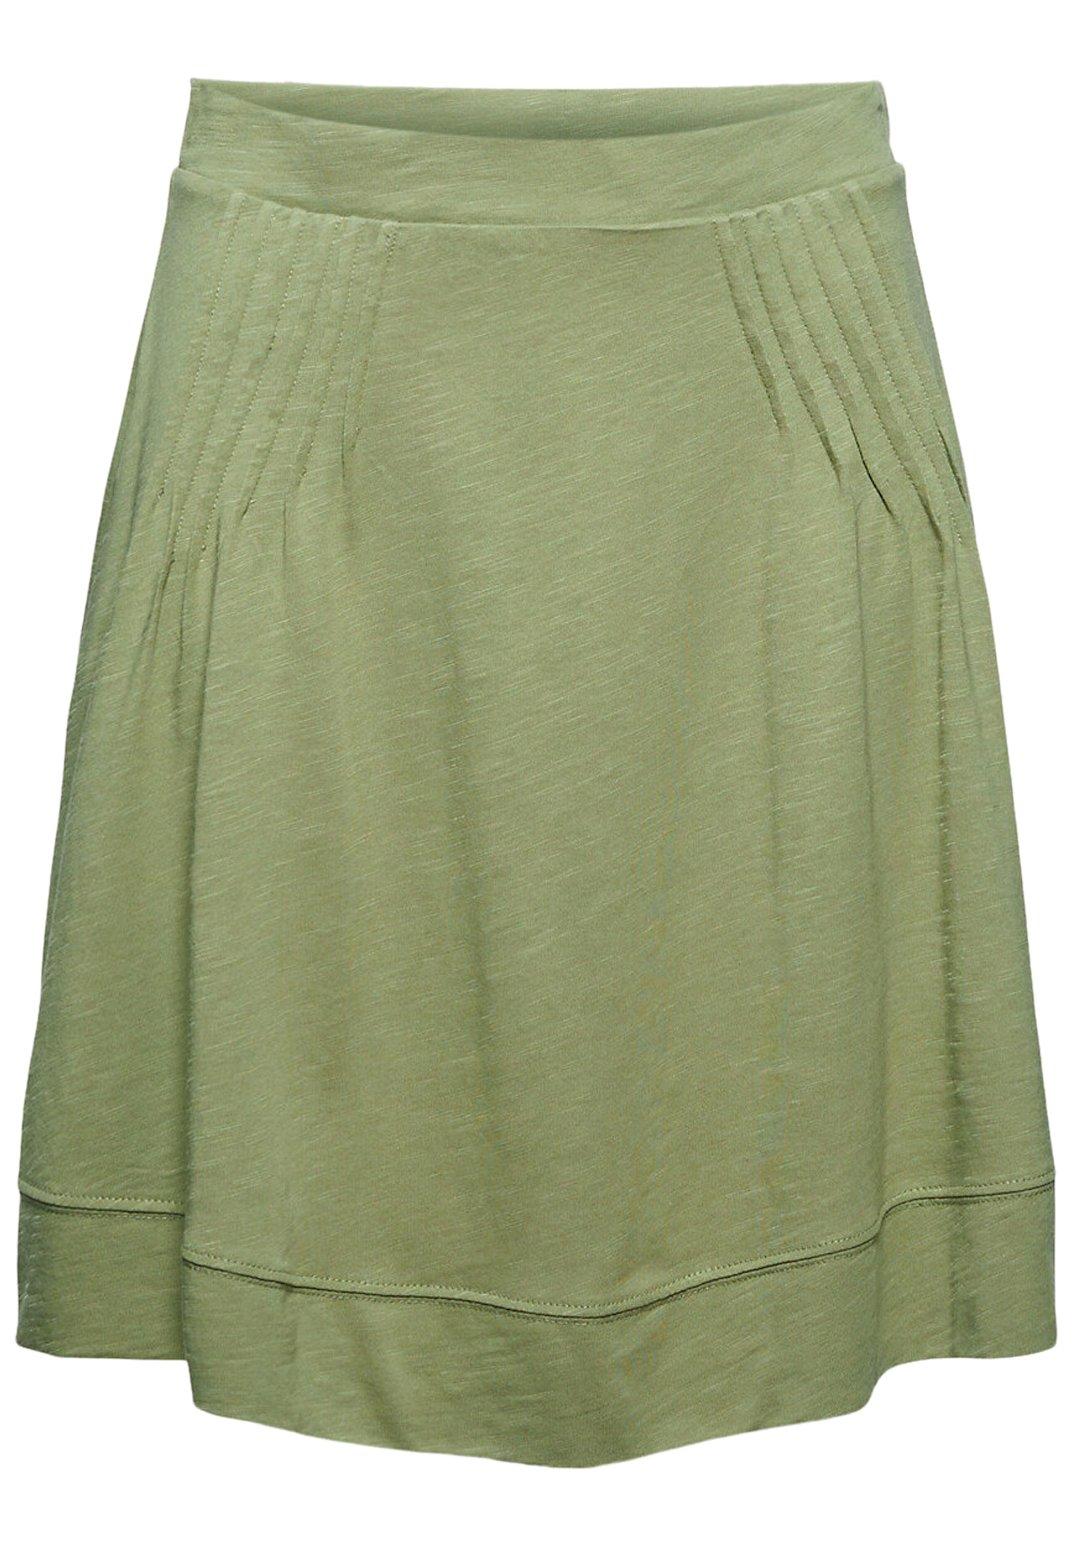 Femme FLARE SKIRT - Minijupe